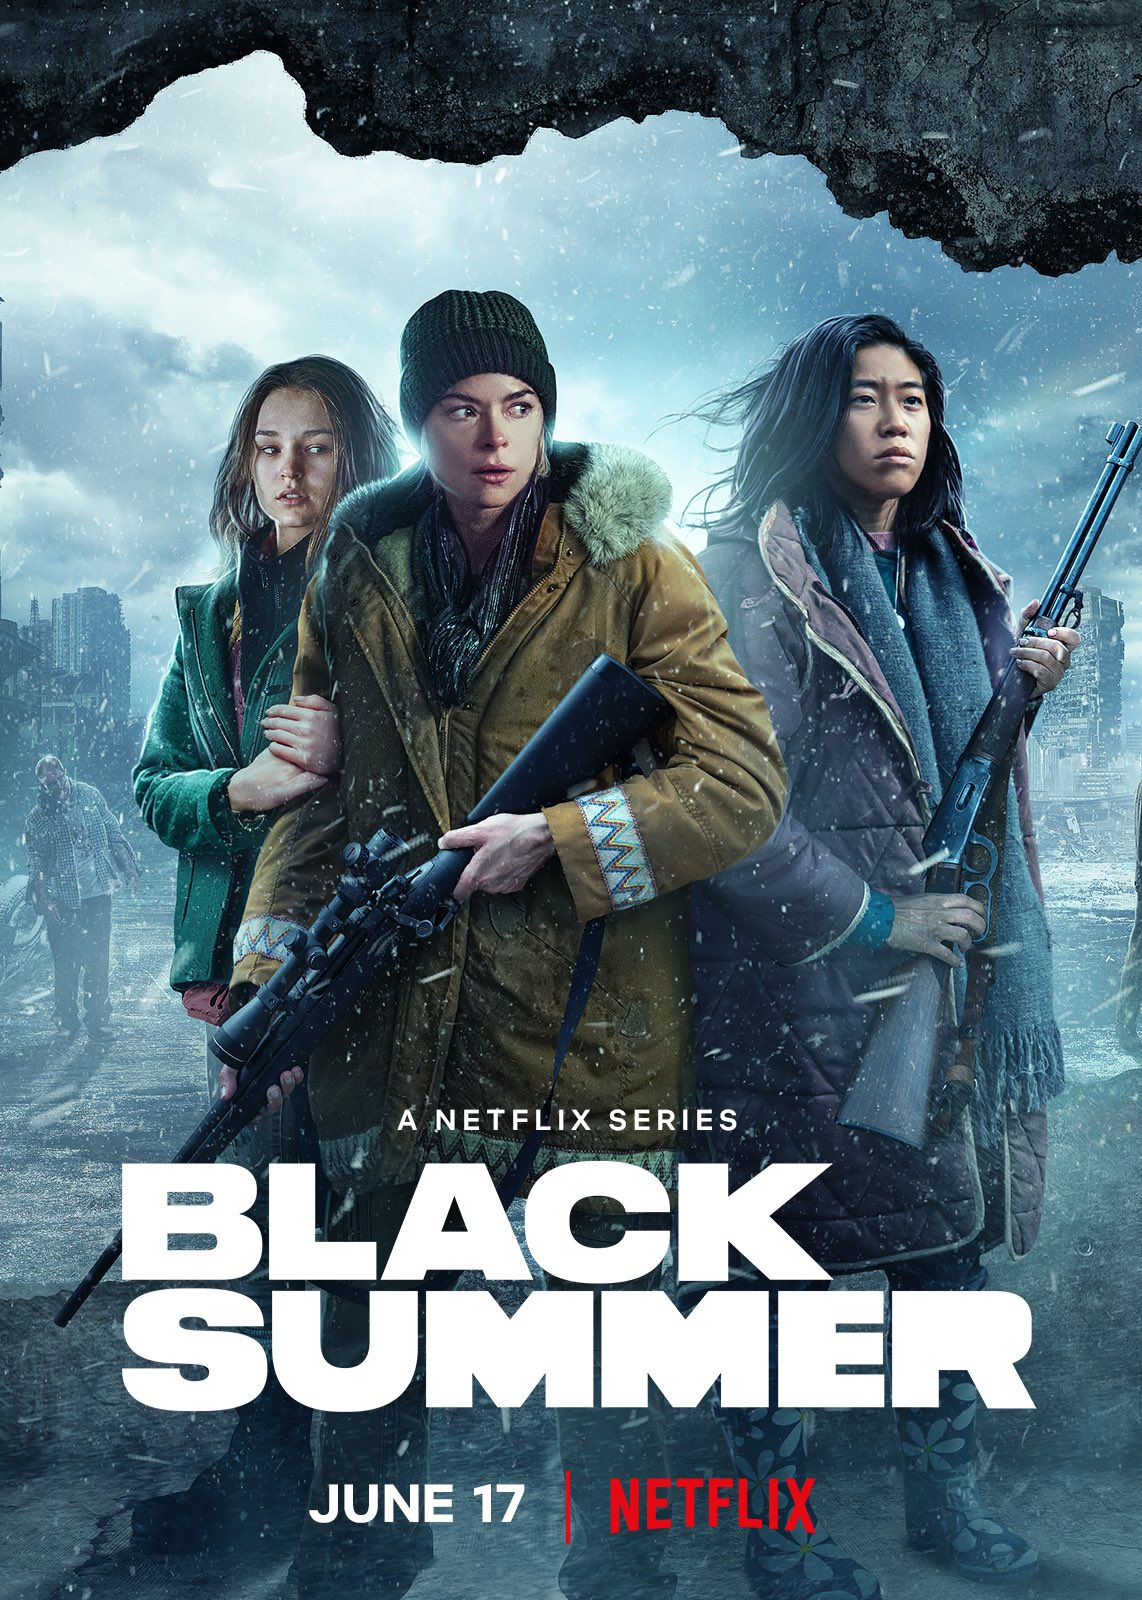 Black Summer Season 2 (2021) ปฏิบัติการนรกเดือด ภาค 2 ซับไทย EP1-EP8 [จบ]